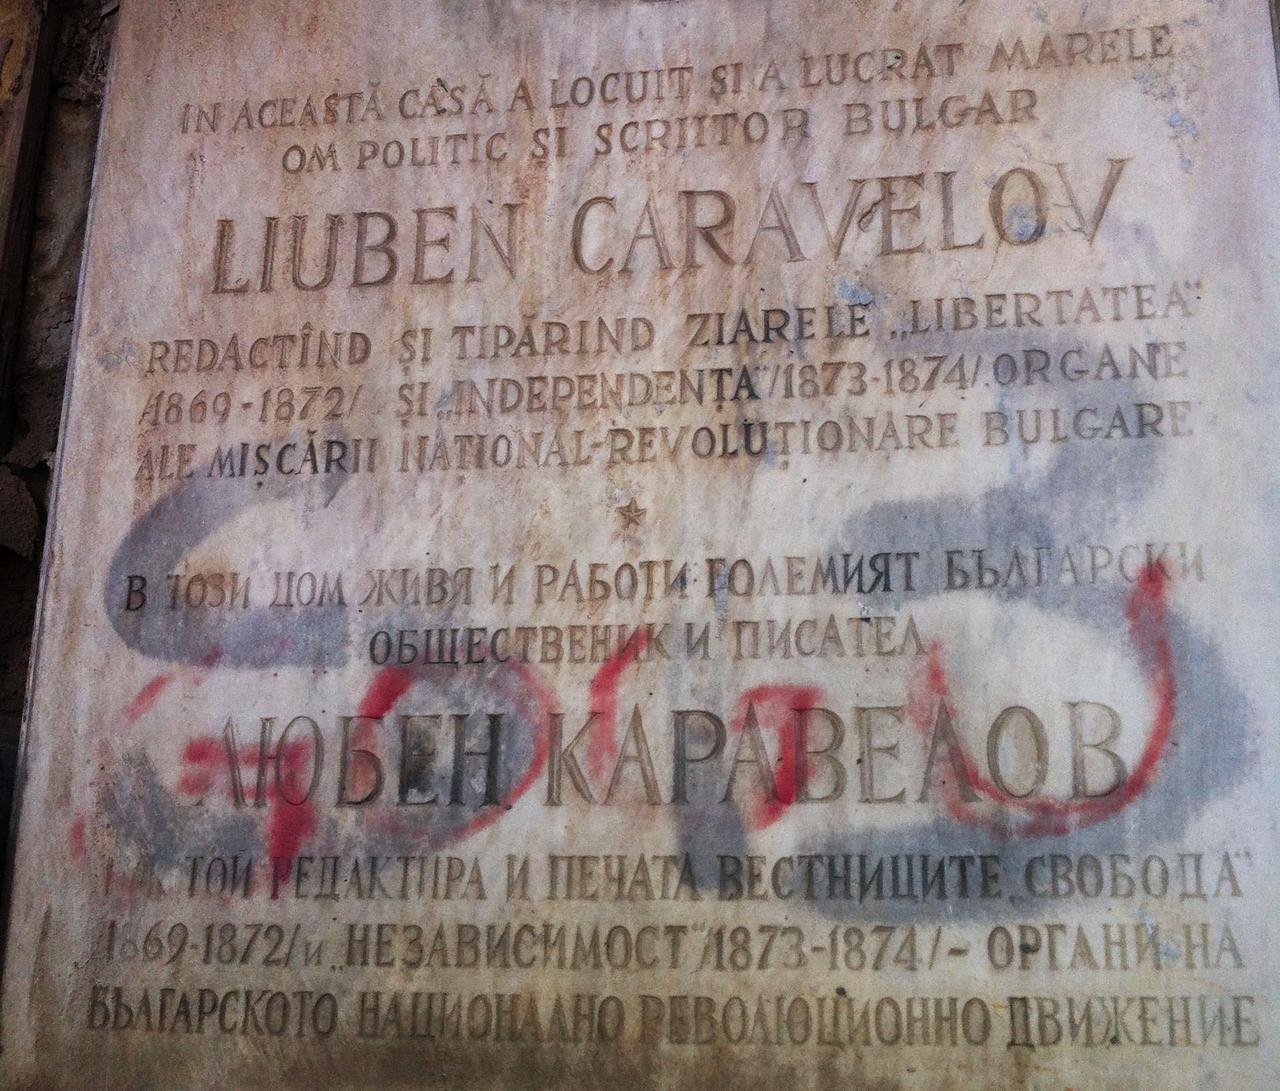 Hanul Solacoglu - Liuben Caravelov